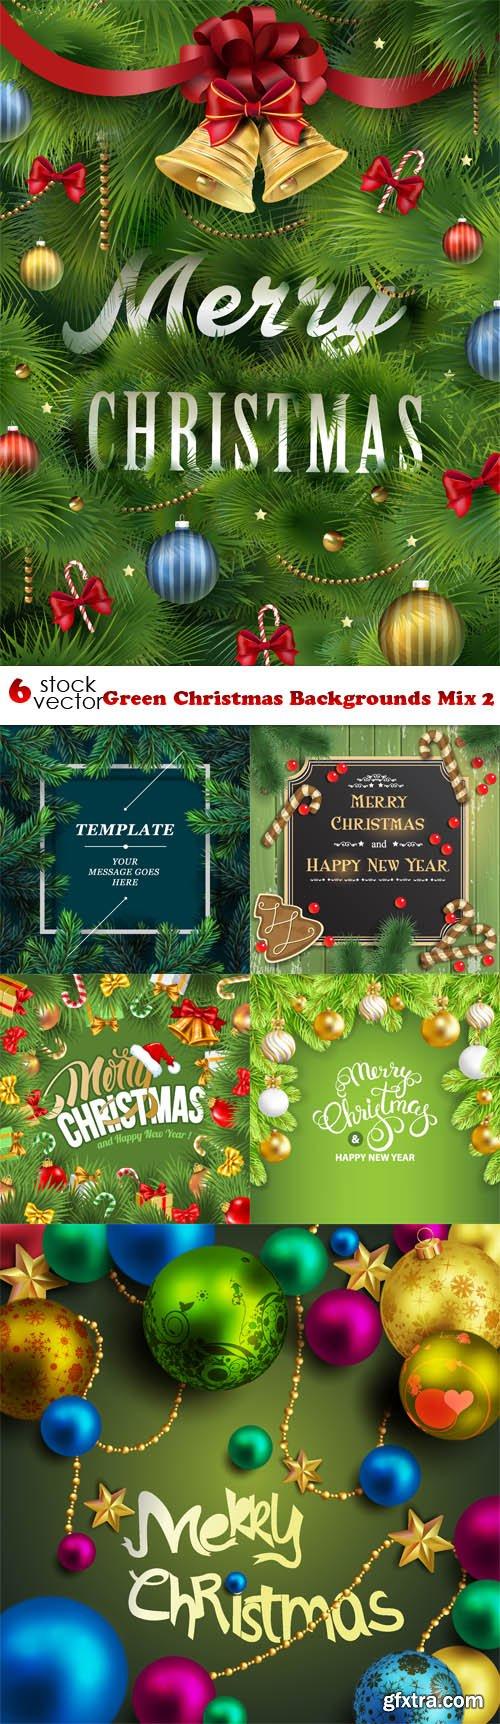 Vectors - Green Christmas Backgrounds Mix 2